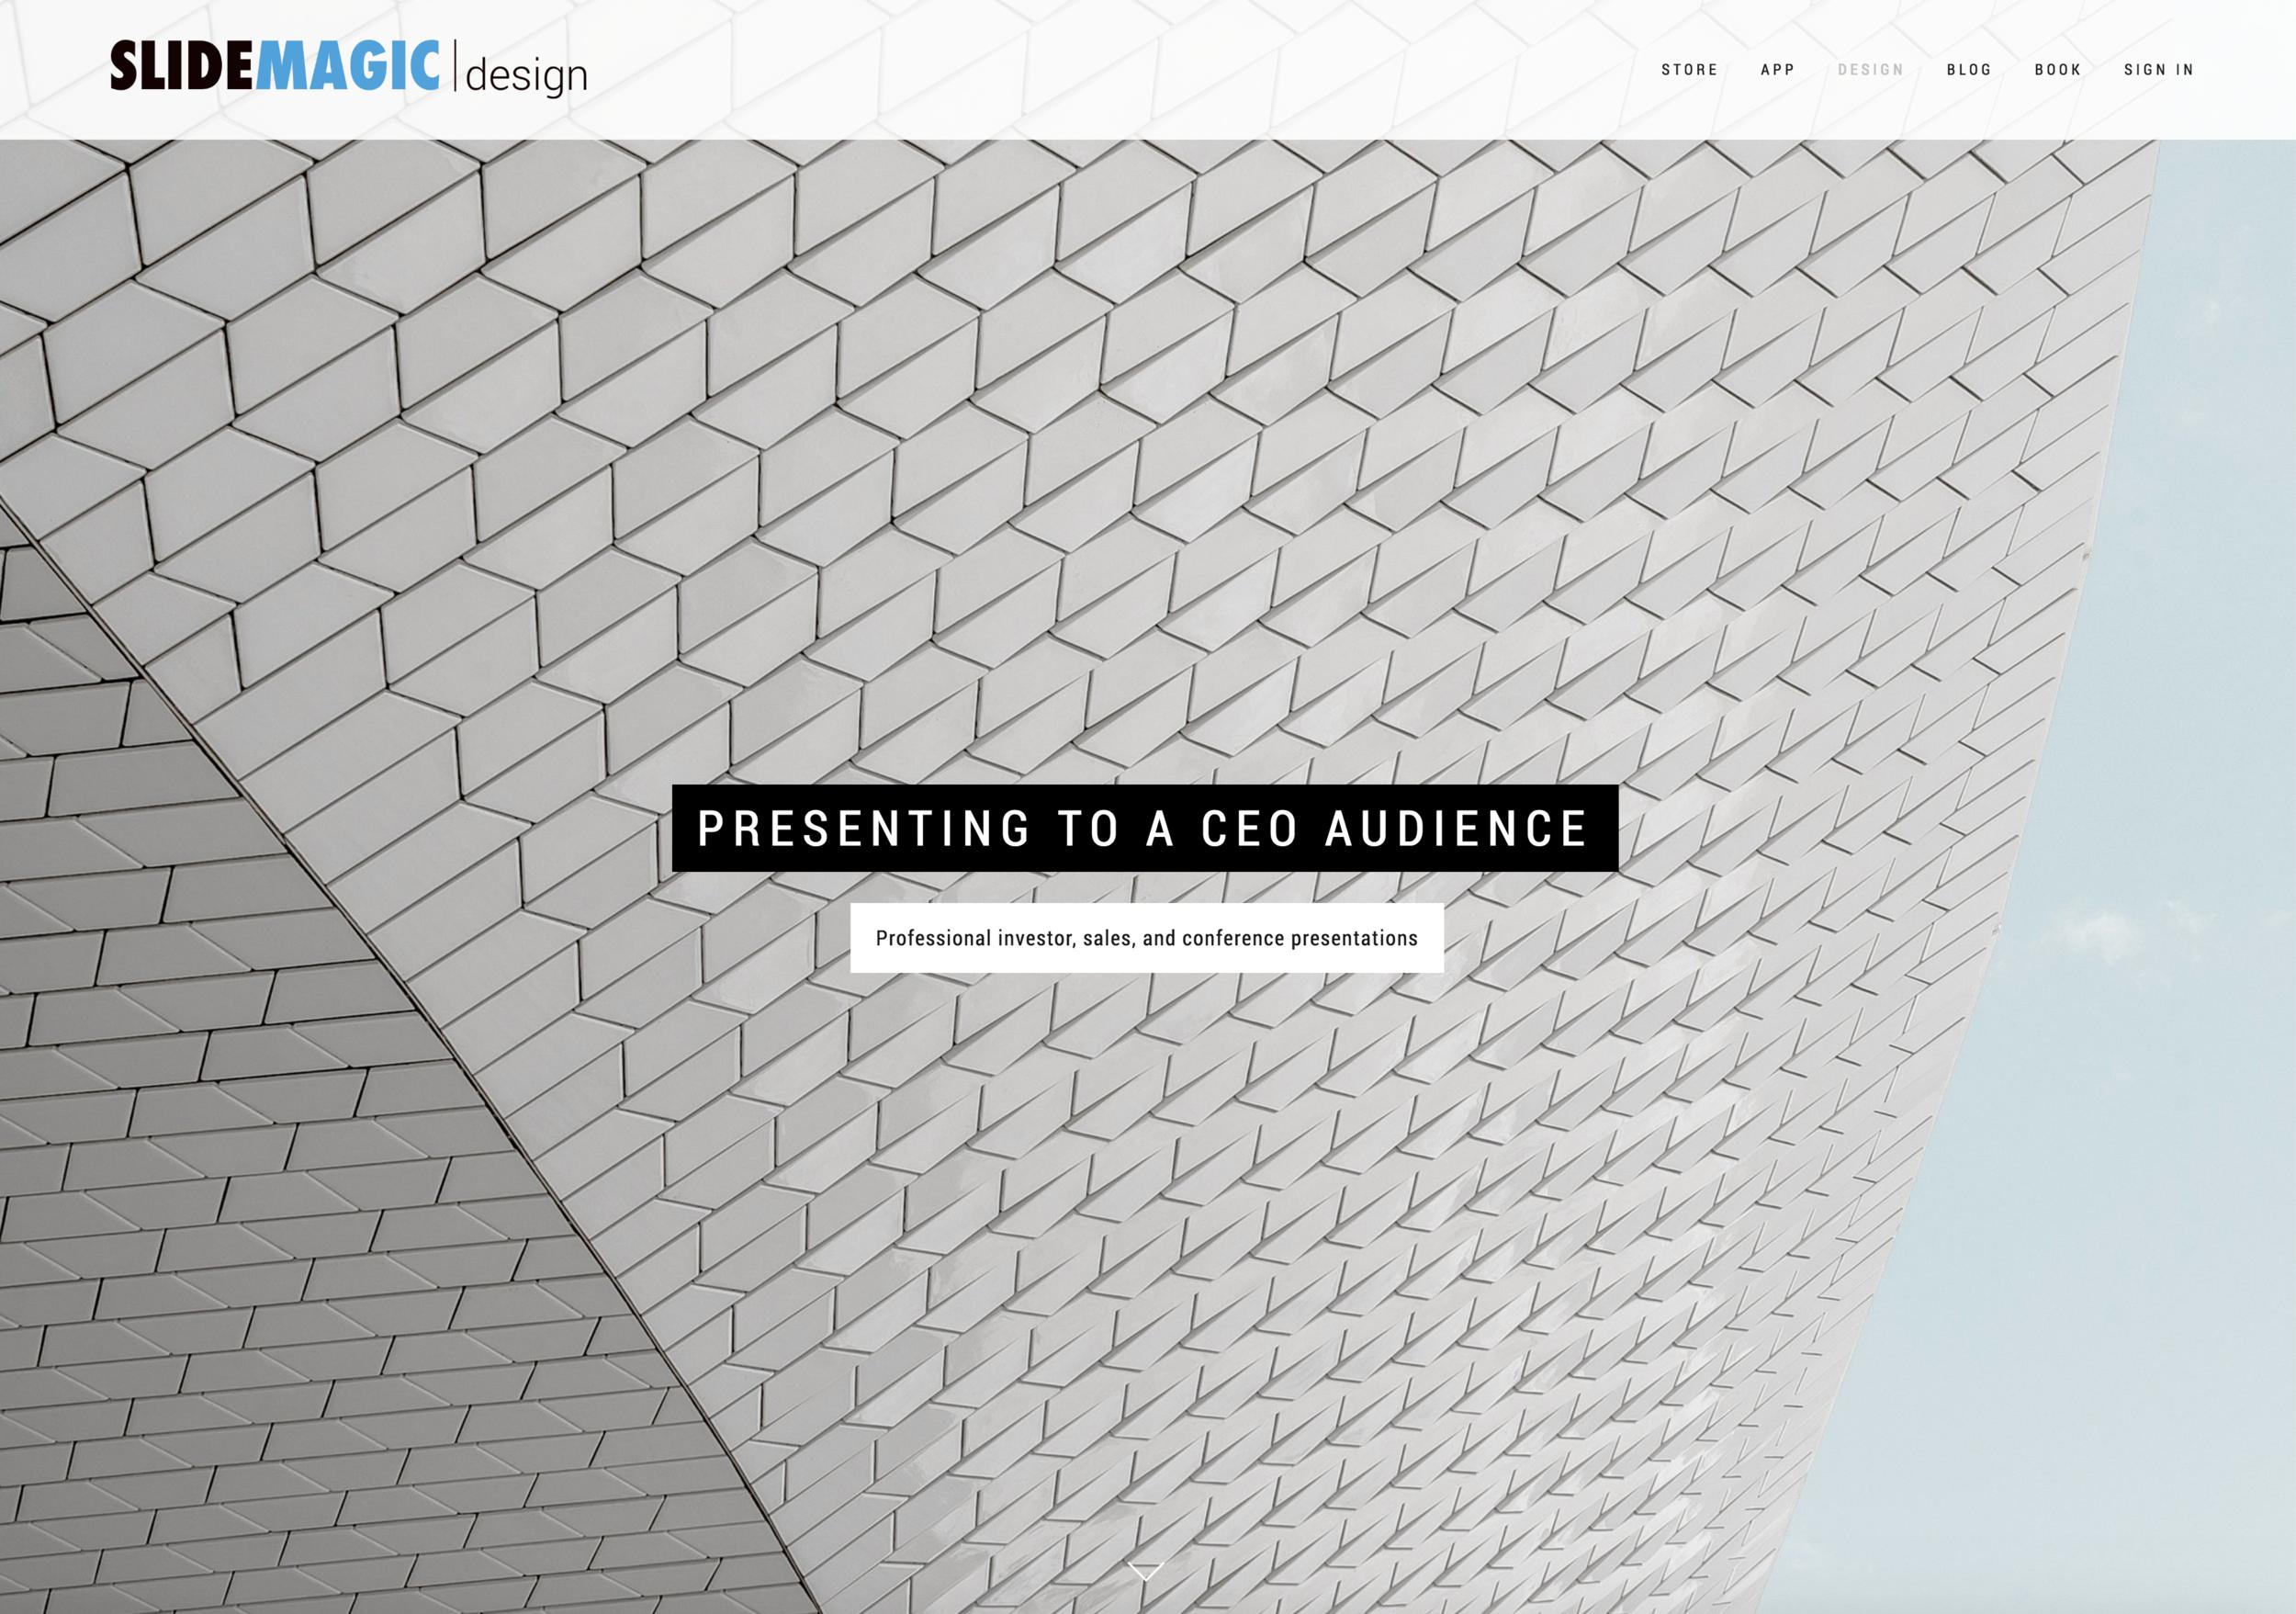 The bespoke design business